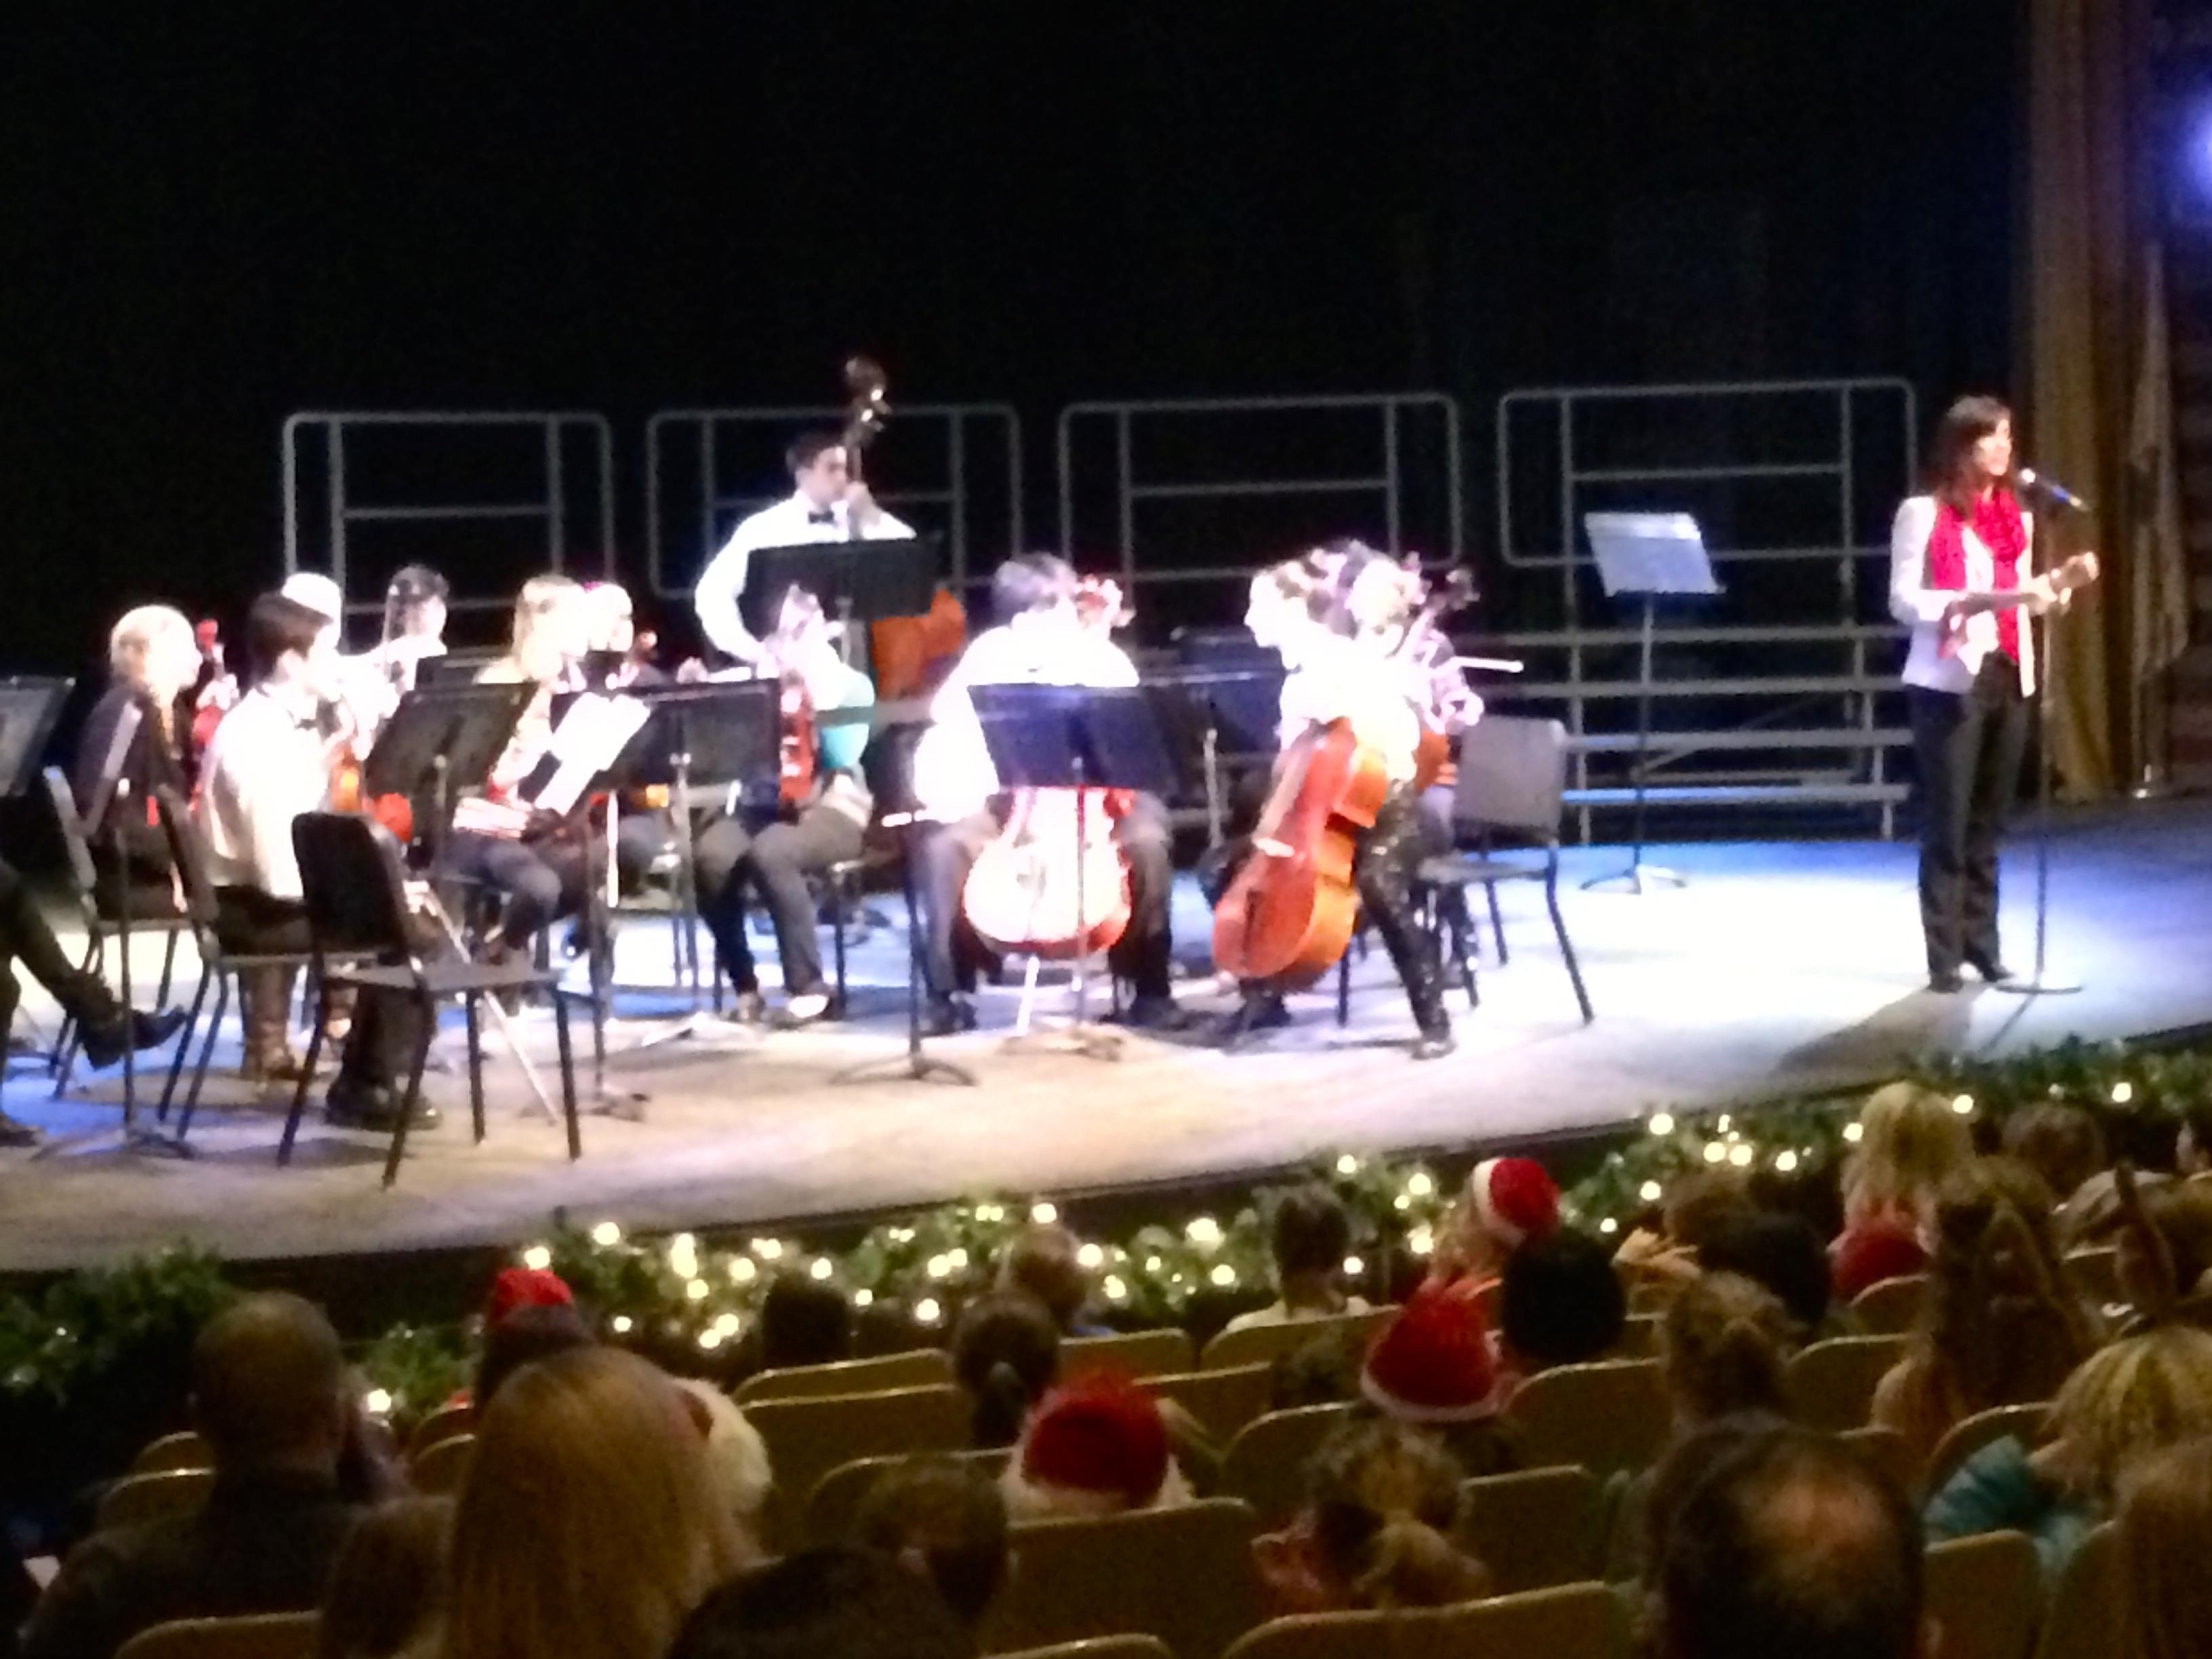 66ca4bd2253f9de6df65_3cf84df104ab29165c1b_Lafayette_Principal_Cheryl_Russo_welcomes_students_to_the_December_23rd_performance.jpg